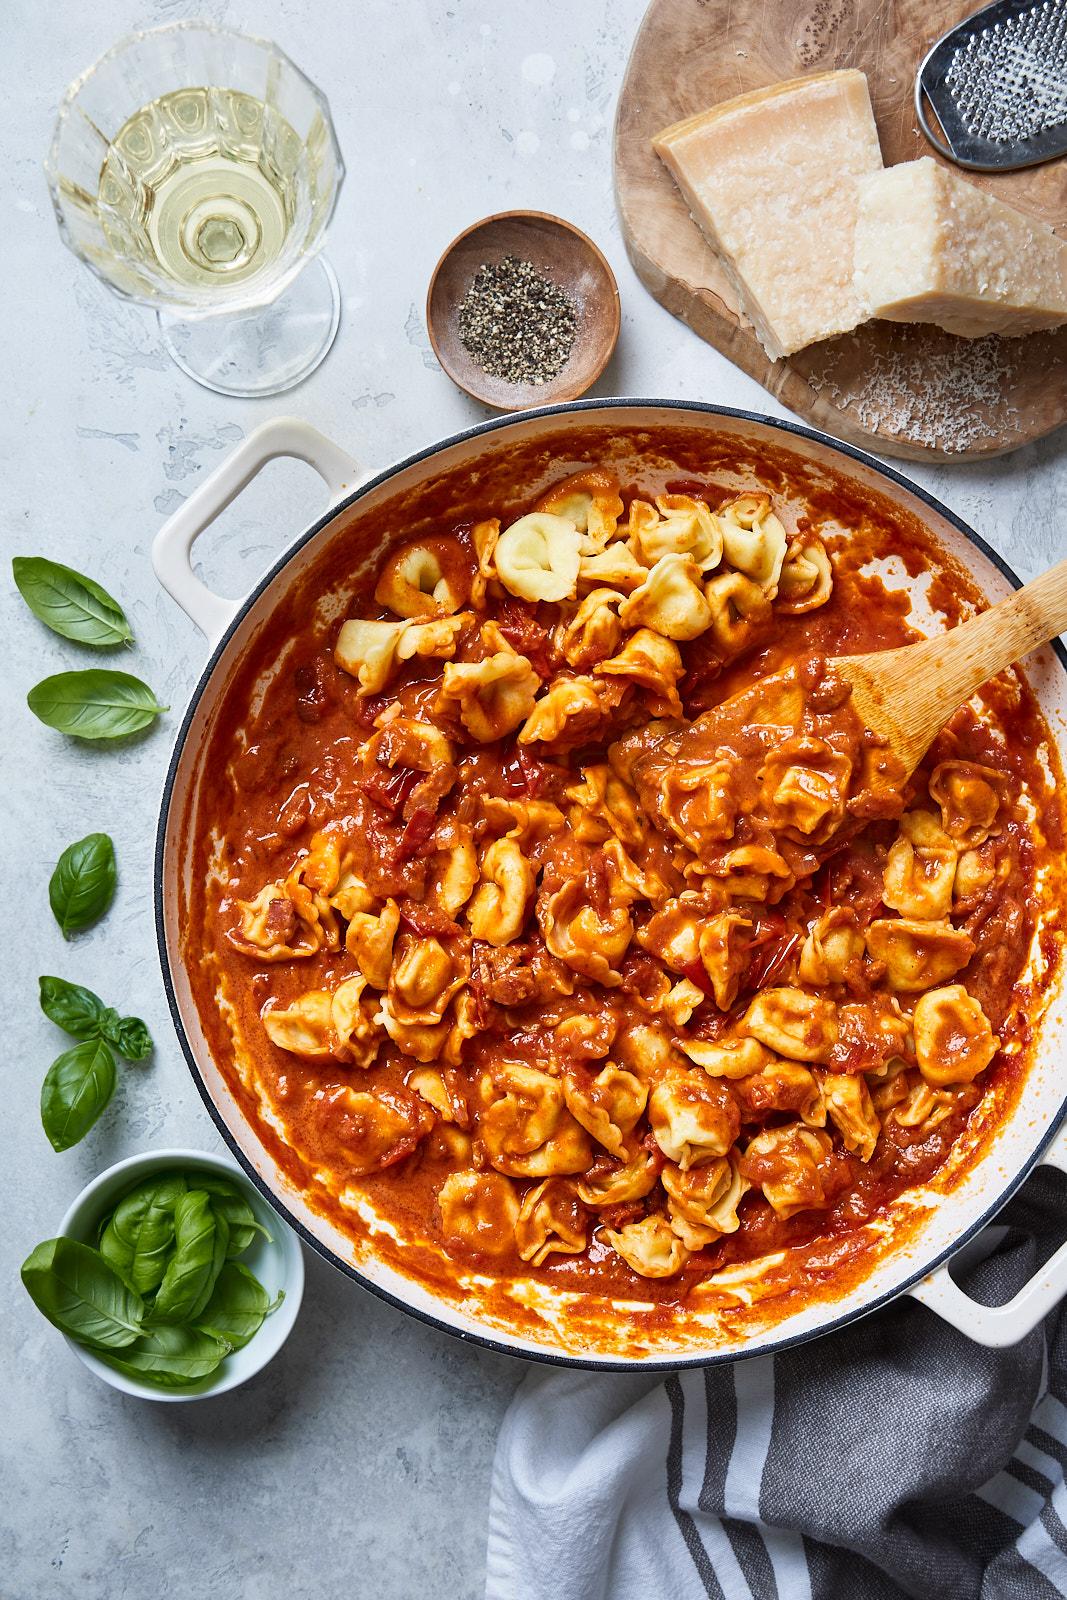 Easy Tortellini Amatriciana